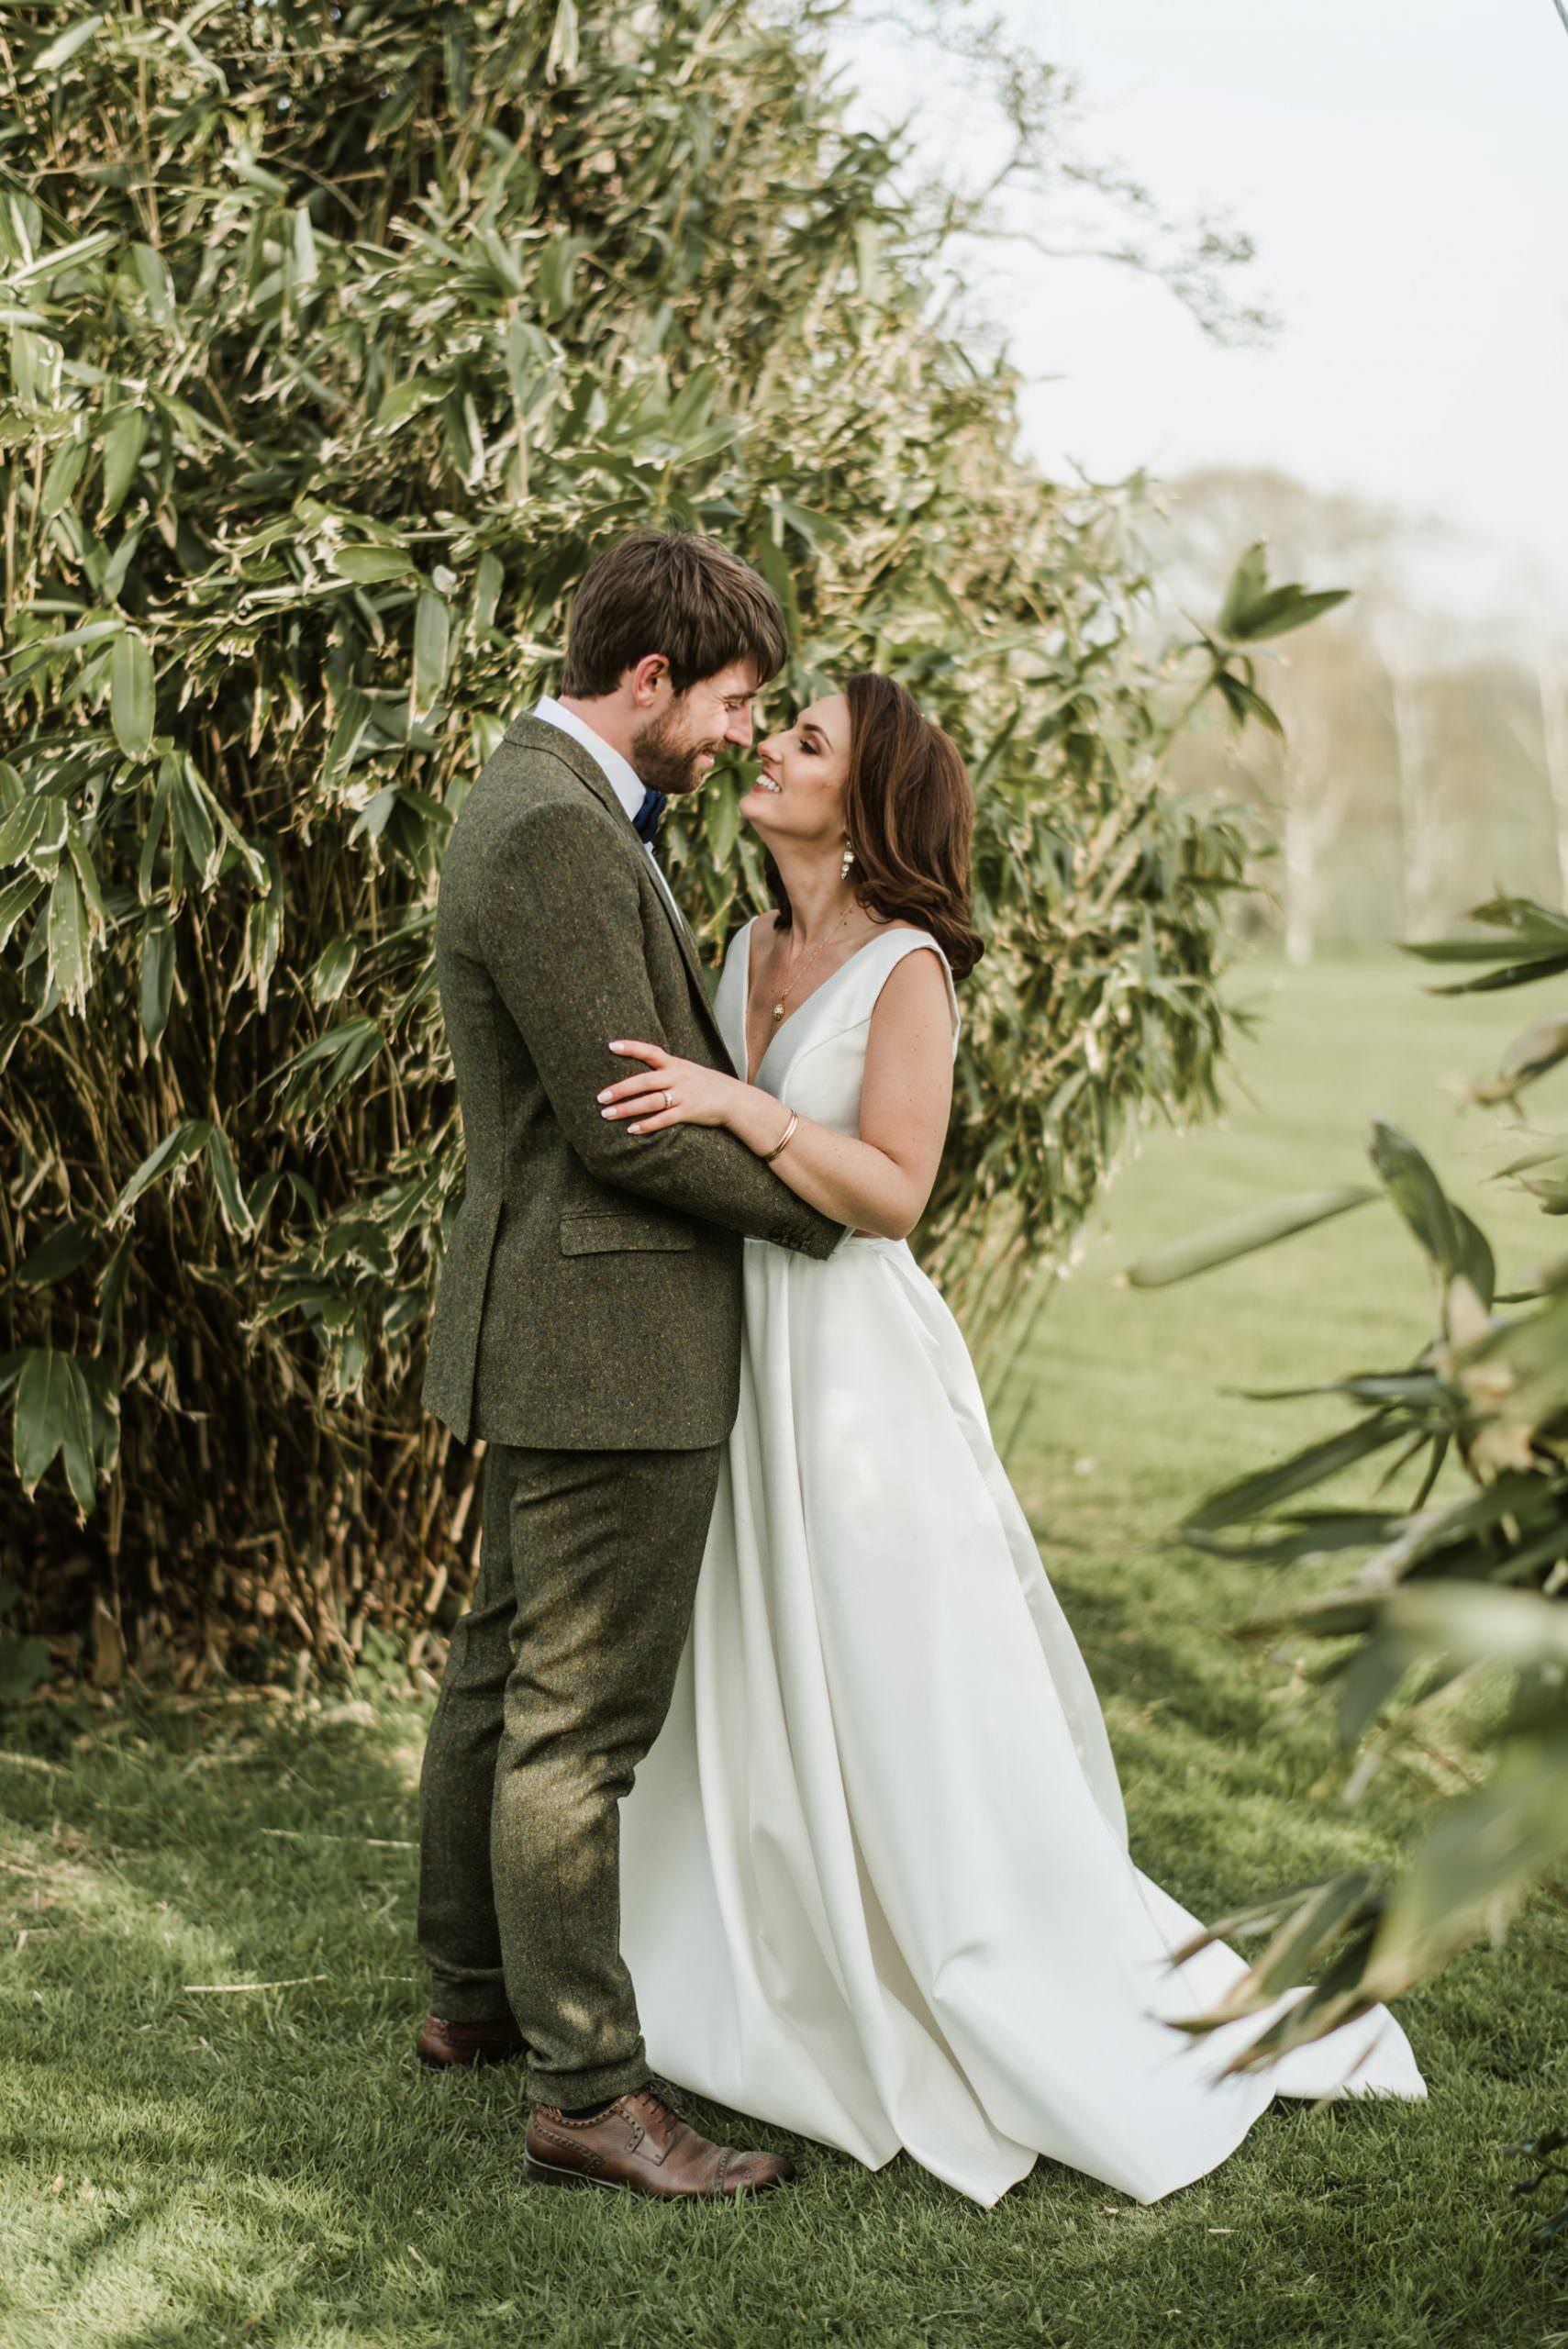 wedding photographer horetown house,wedding photos,best wedding photos,horetown house,garden ,